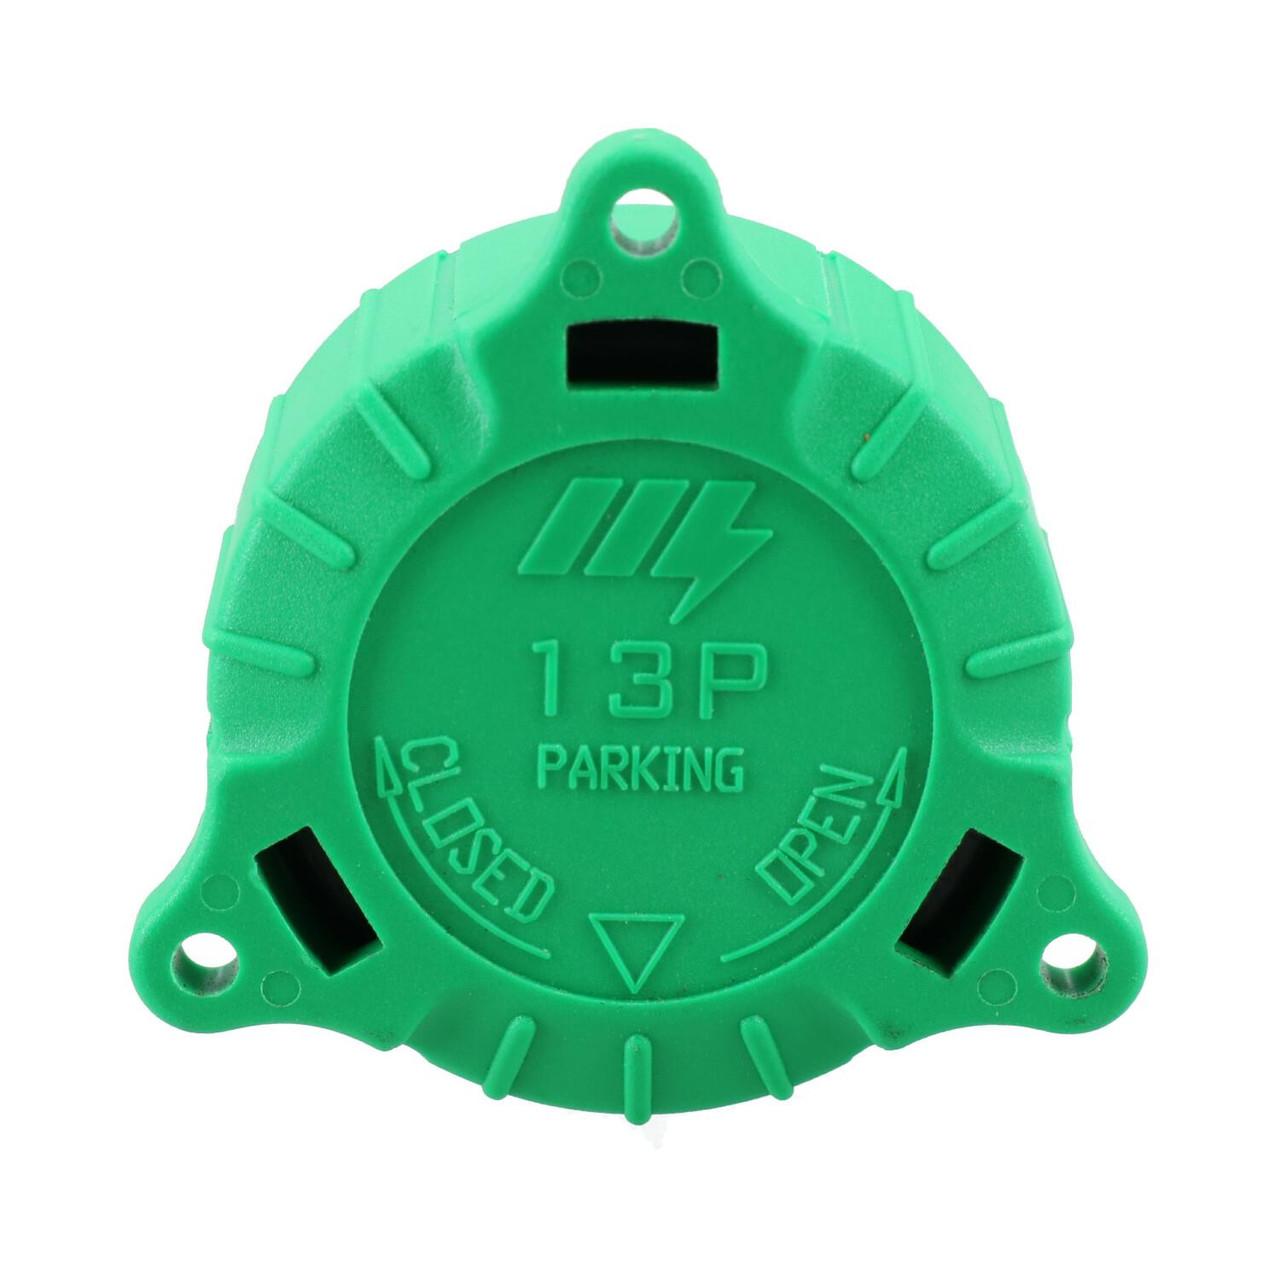 13 Pin Trailer Caravan Plug Protective Storage Alignment Cap Cover Holder